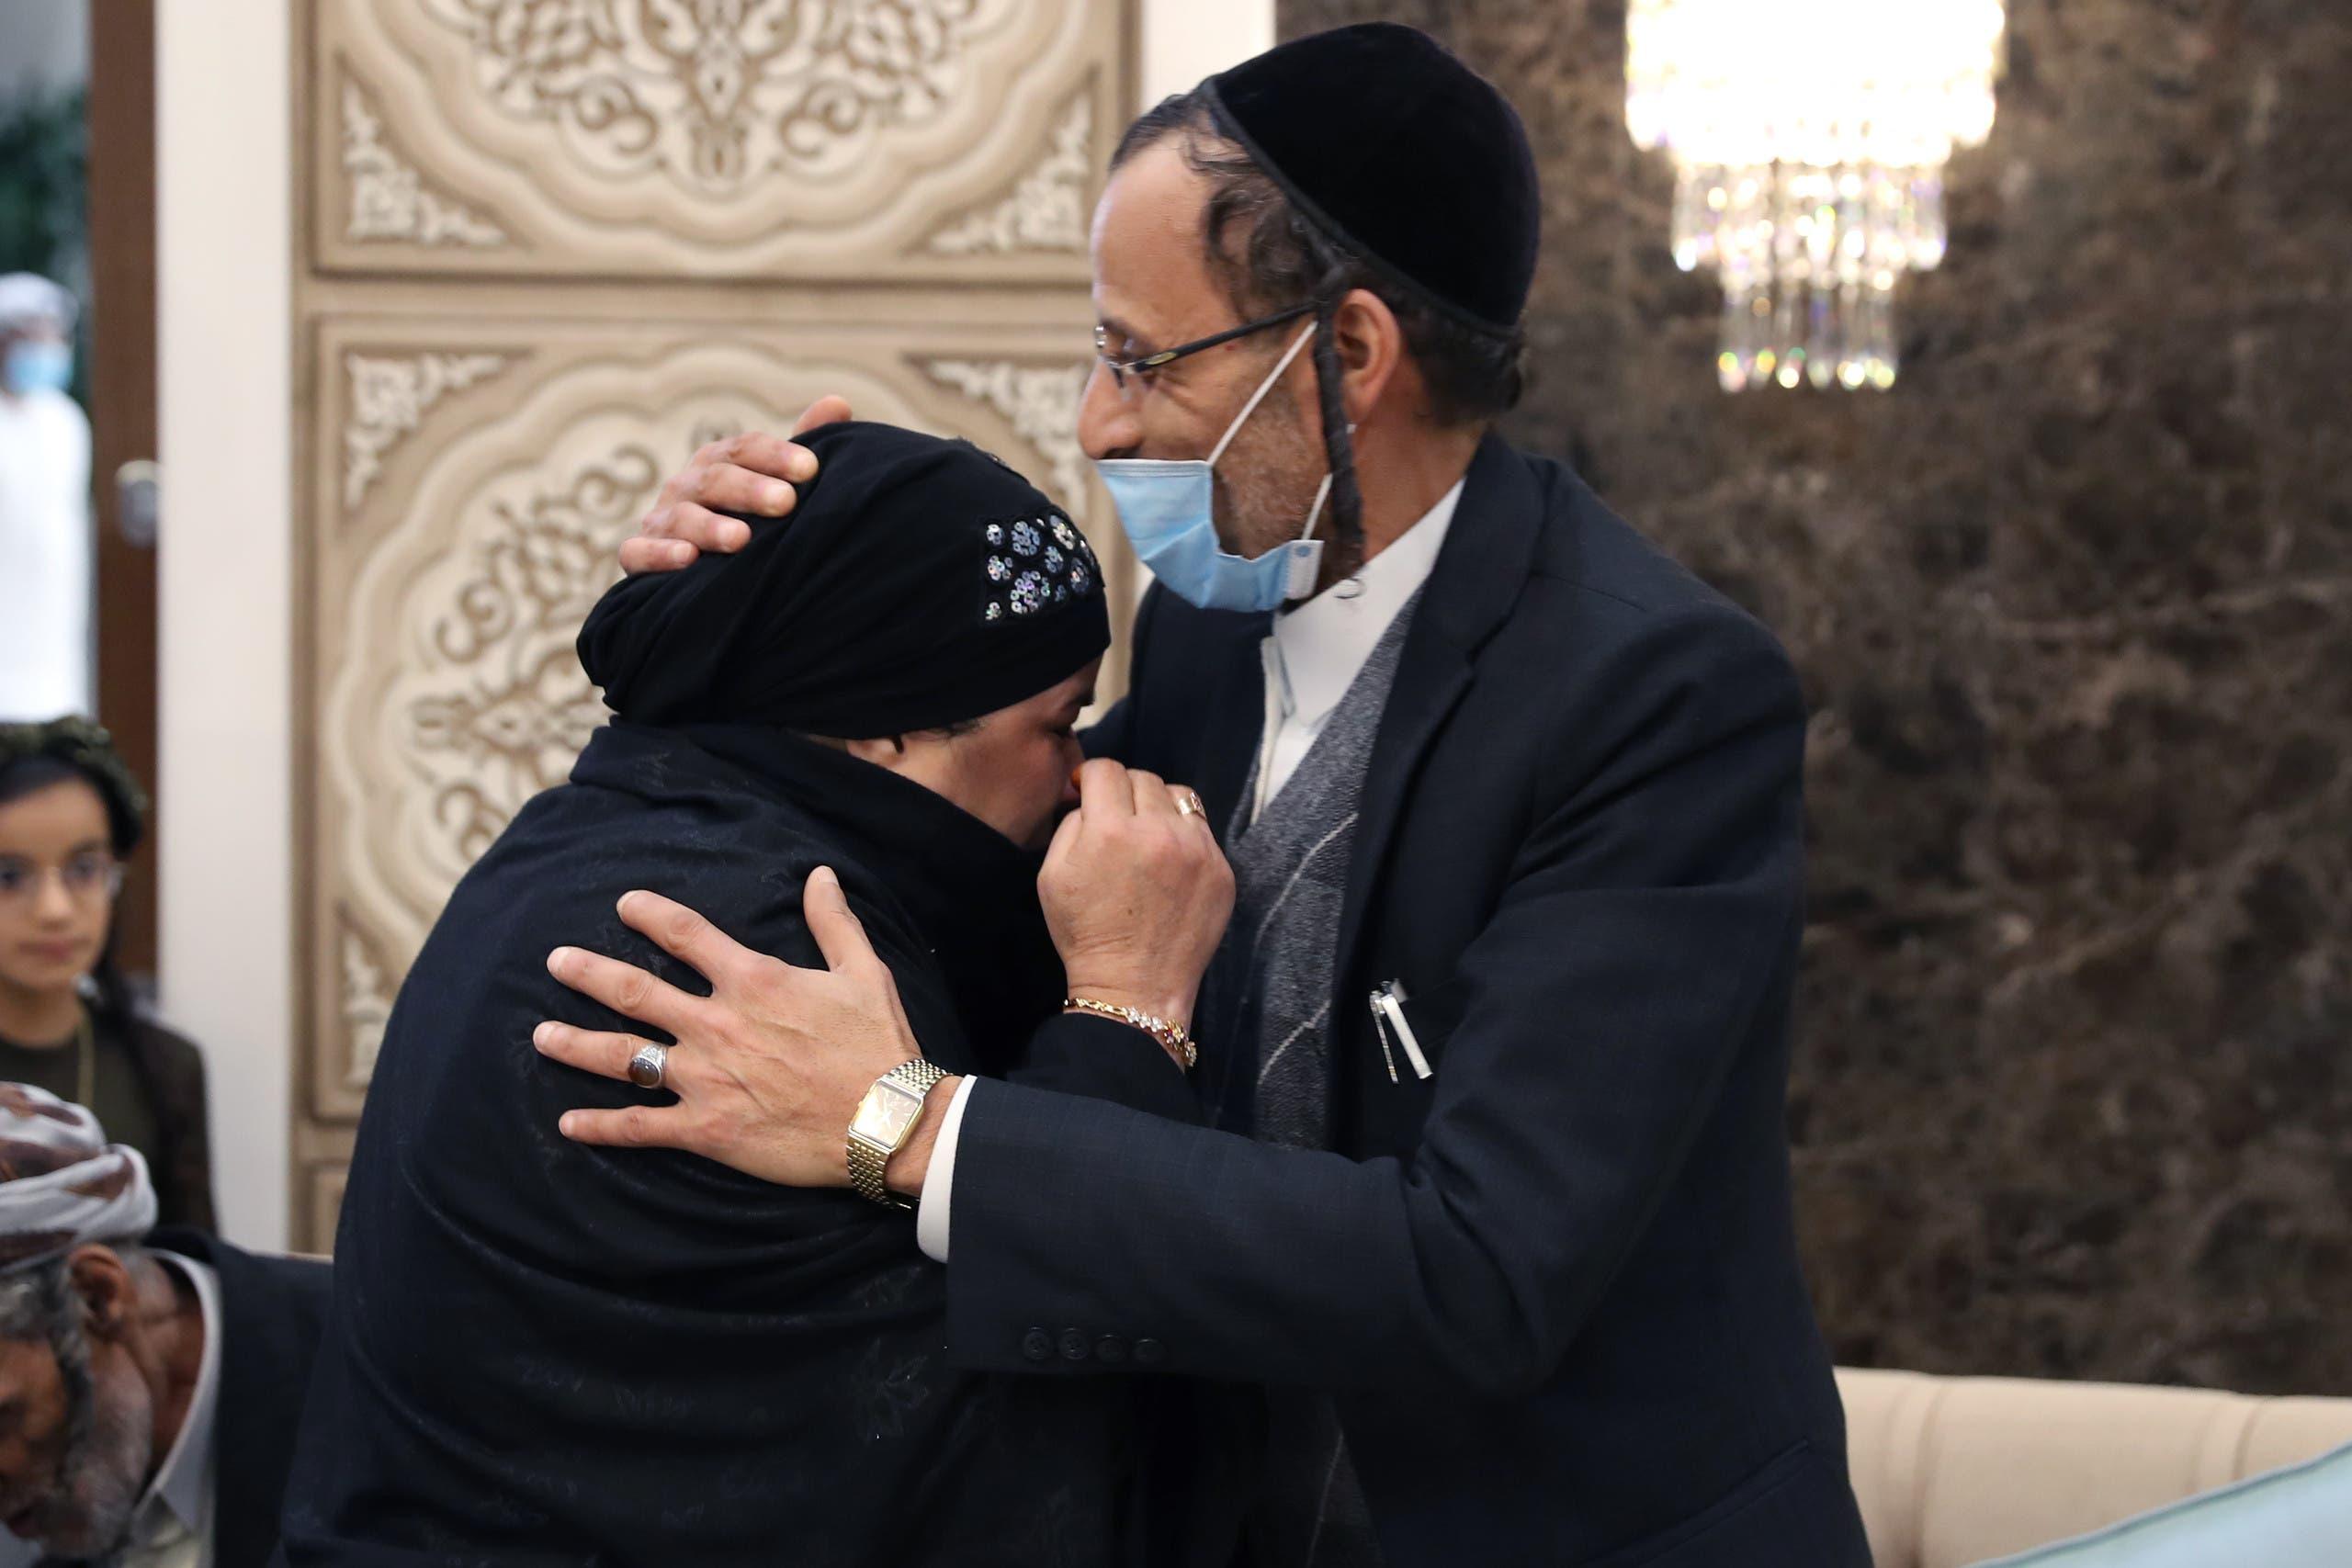 UAE reunites two Jewish Yemeni families after decades apart. (WAM News Agency)